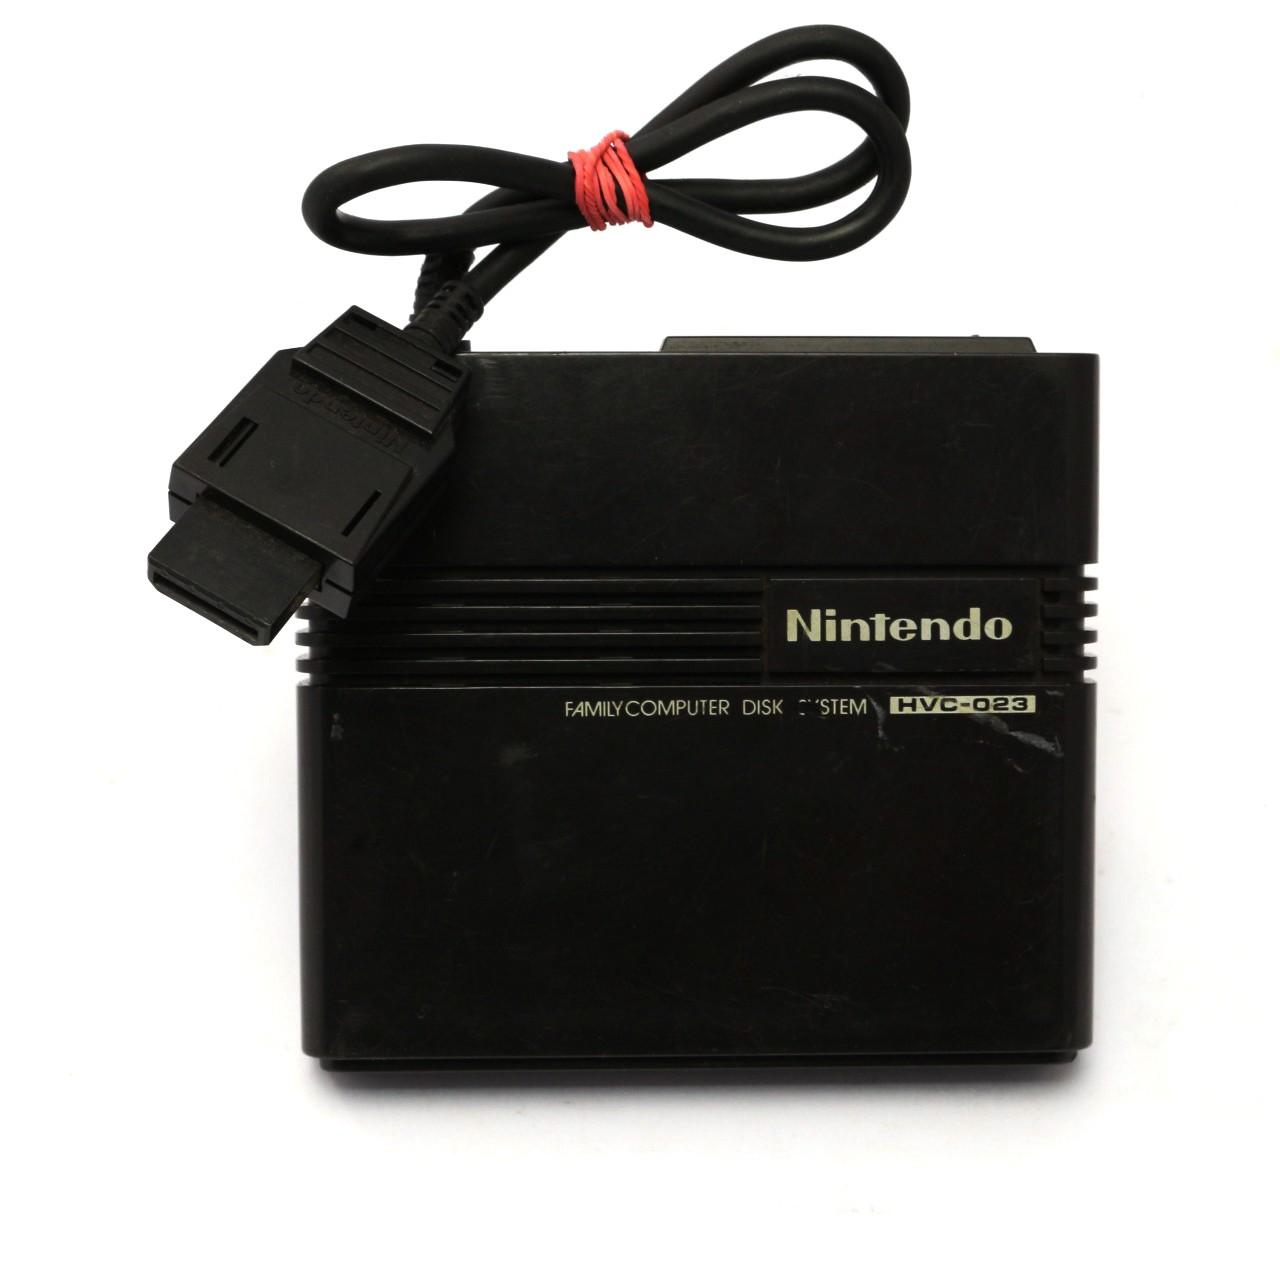 NES / Famicom - Family Computer Disk System / RAM Adapter HVC-023